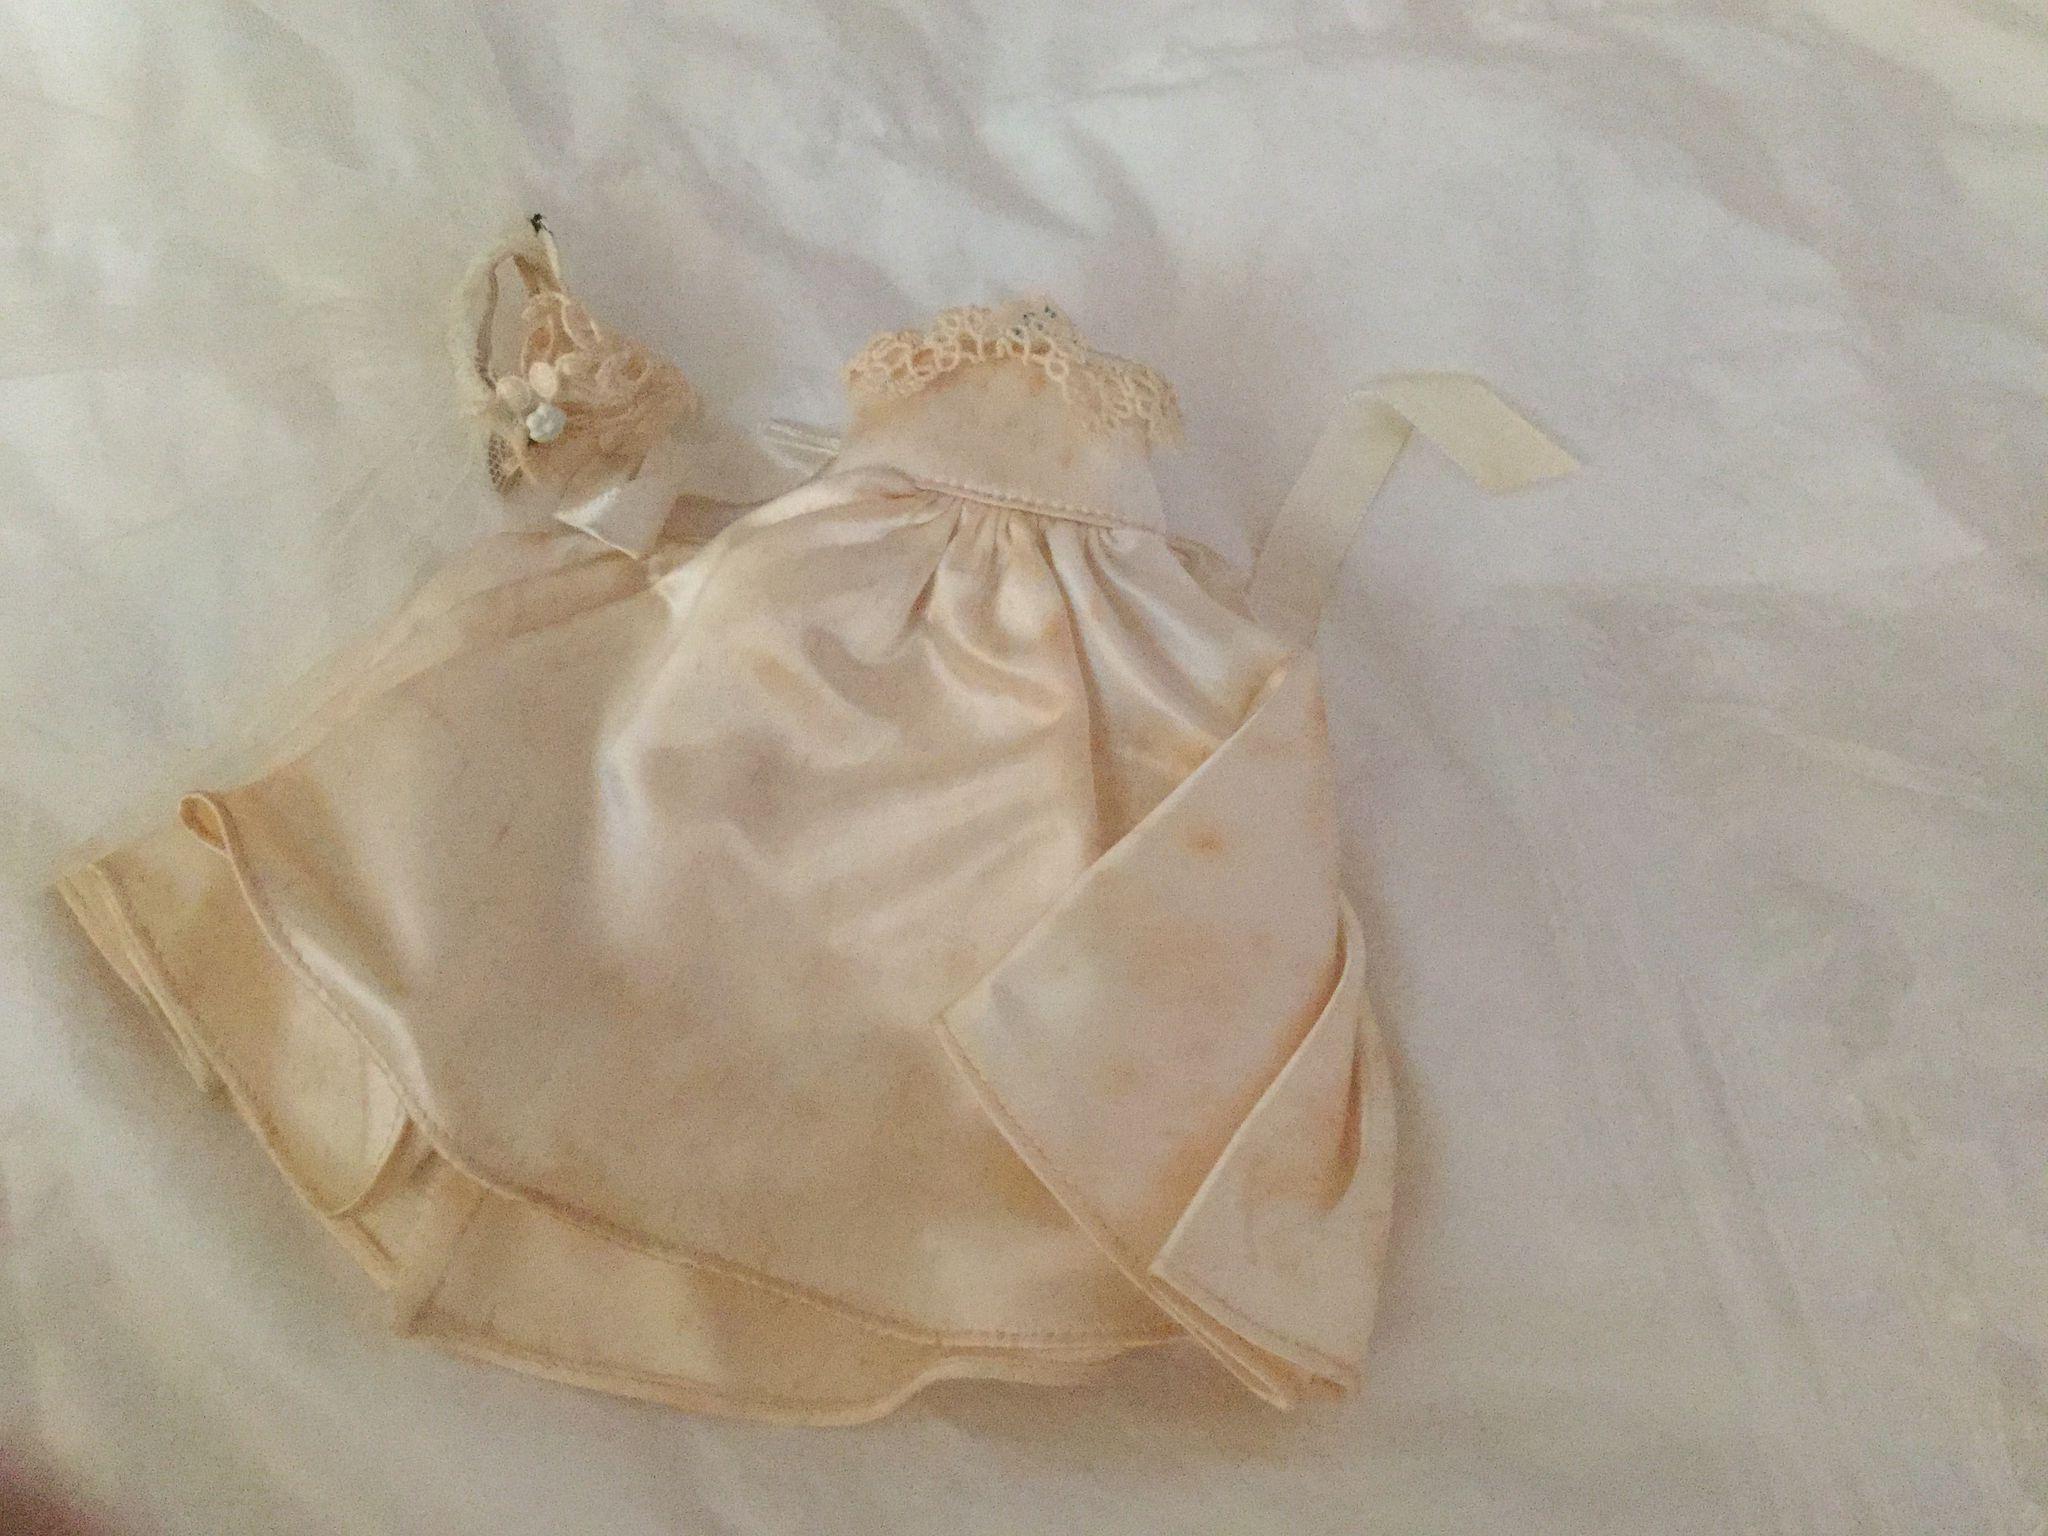 1950's Madame Alexander Alexander-kins Bride Dress and Veil